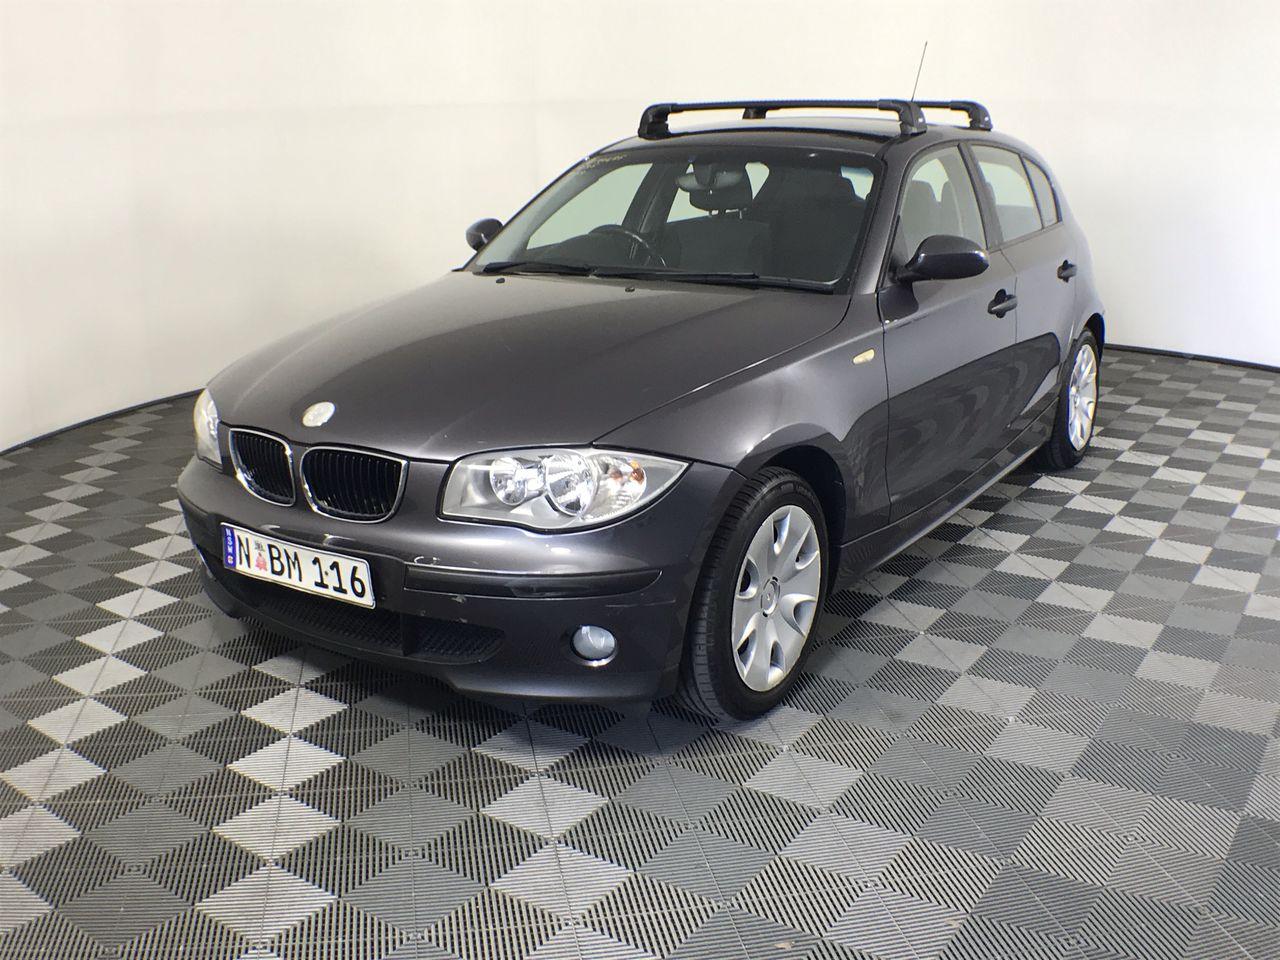 2004 BMW 1 16i E87 Manual Hatchback 93,282km